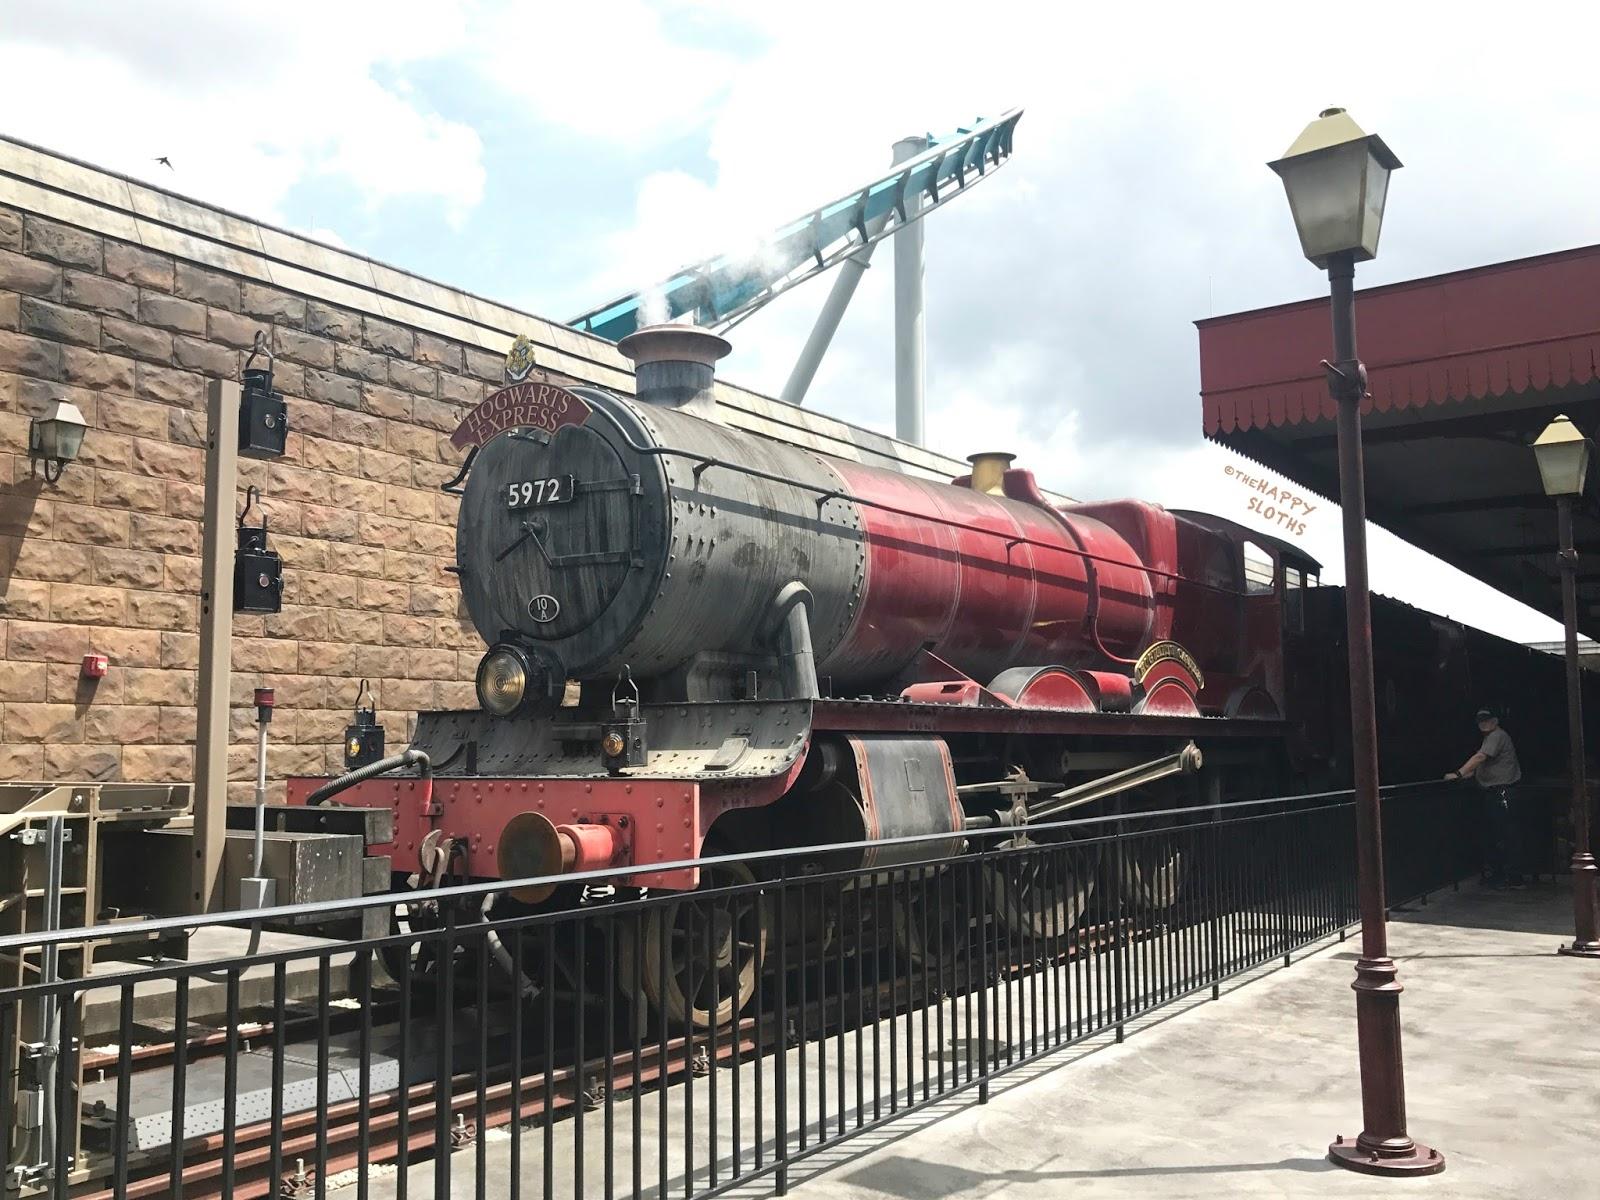 Universal Studios Wizarding World Harry Potter Iron-On Patch Hogwarts Railways